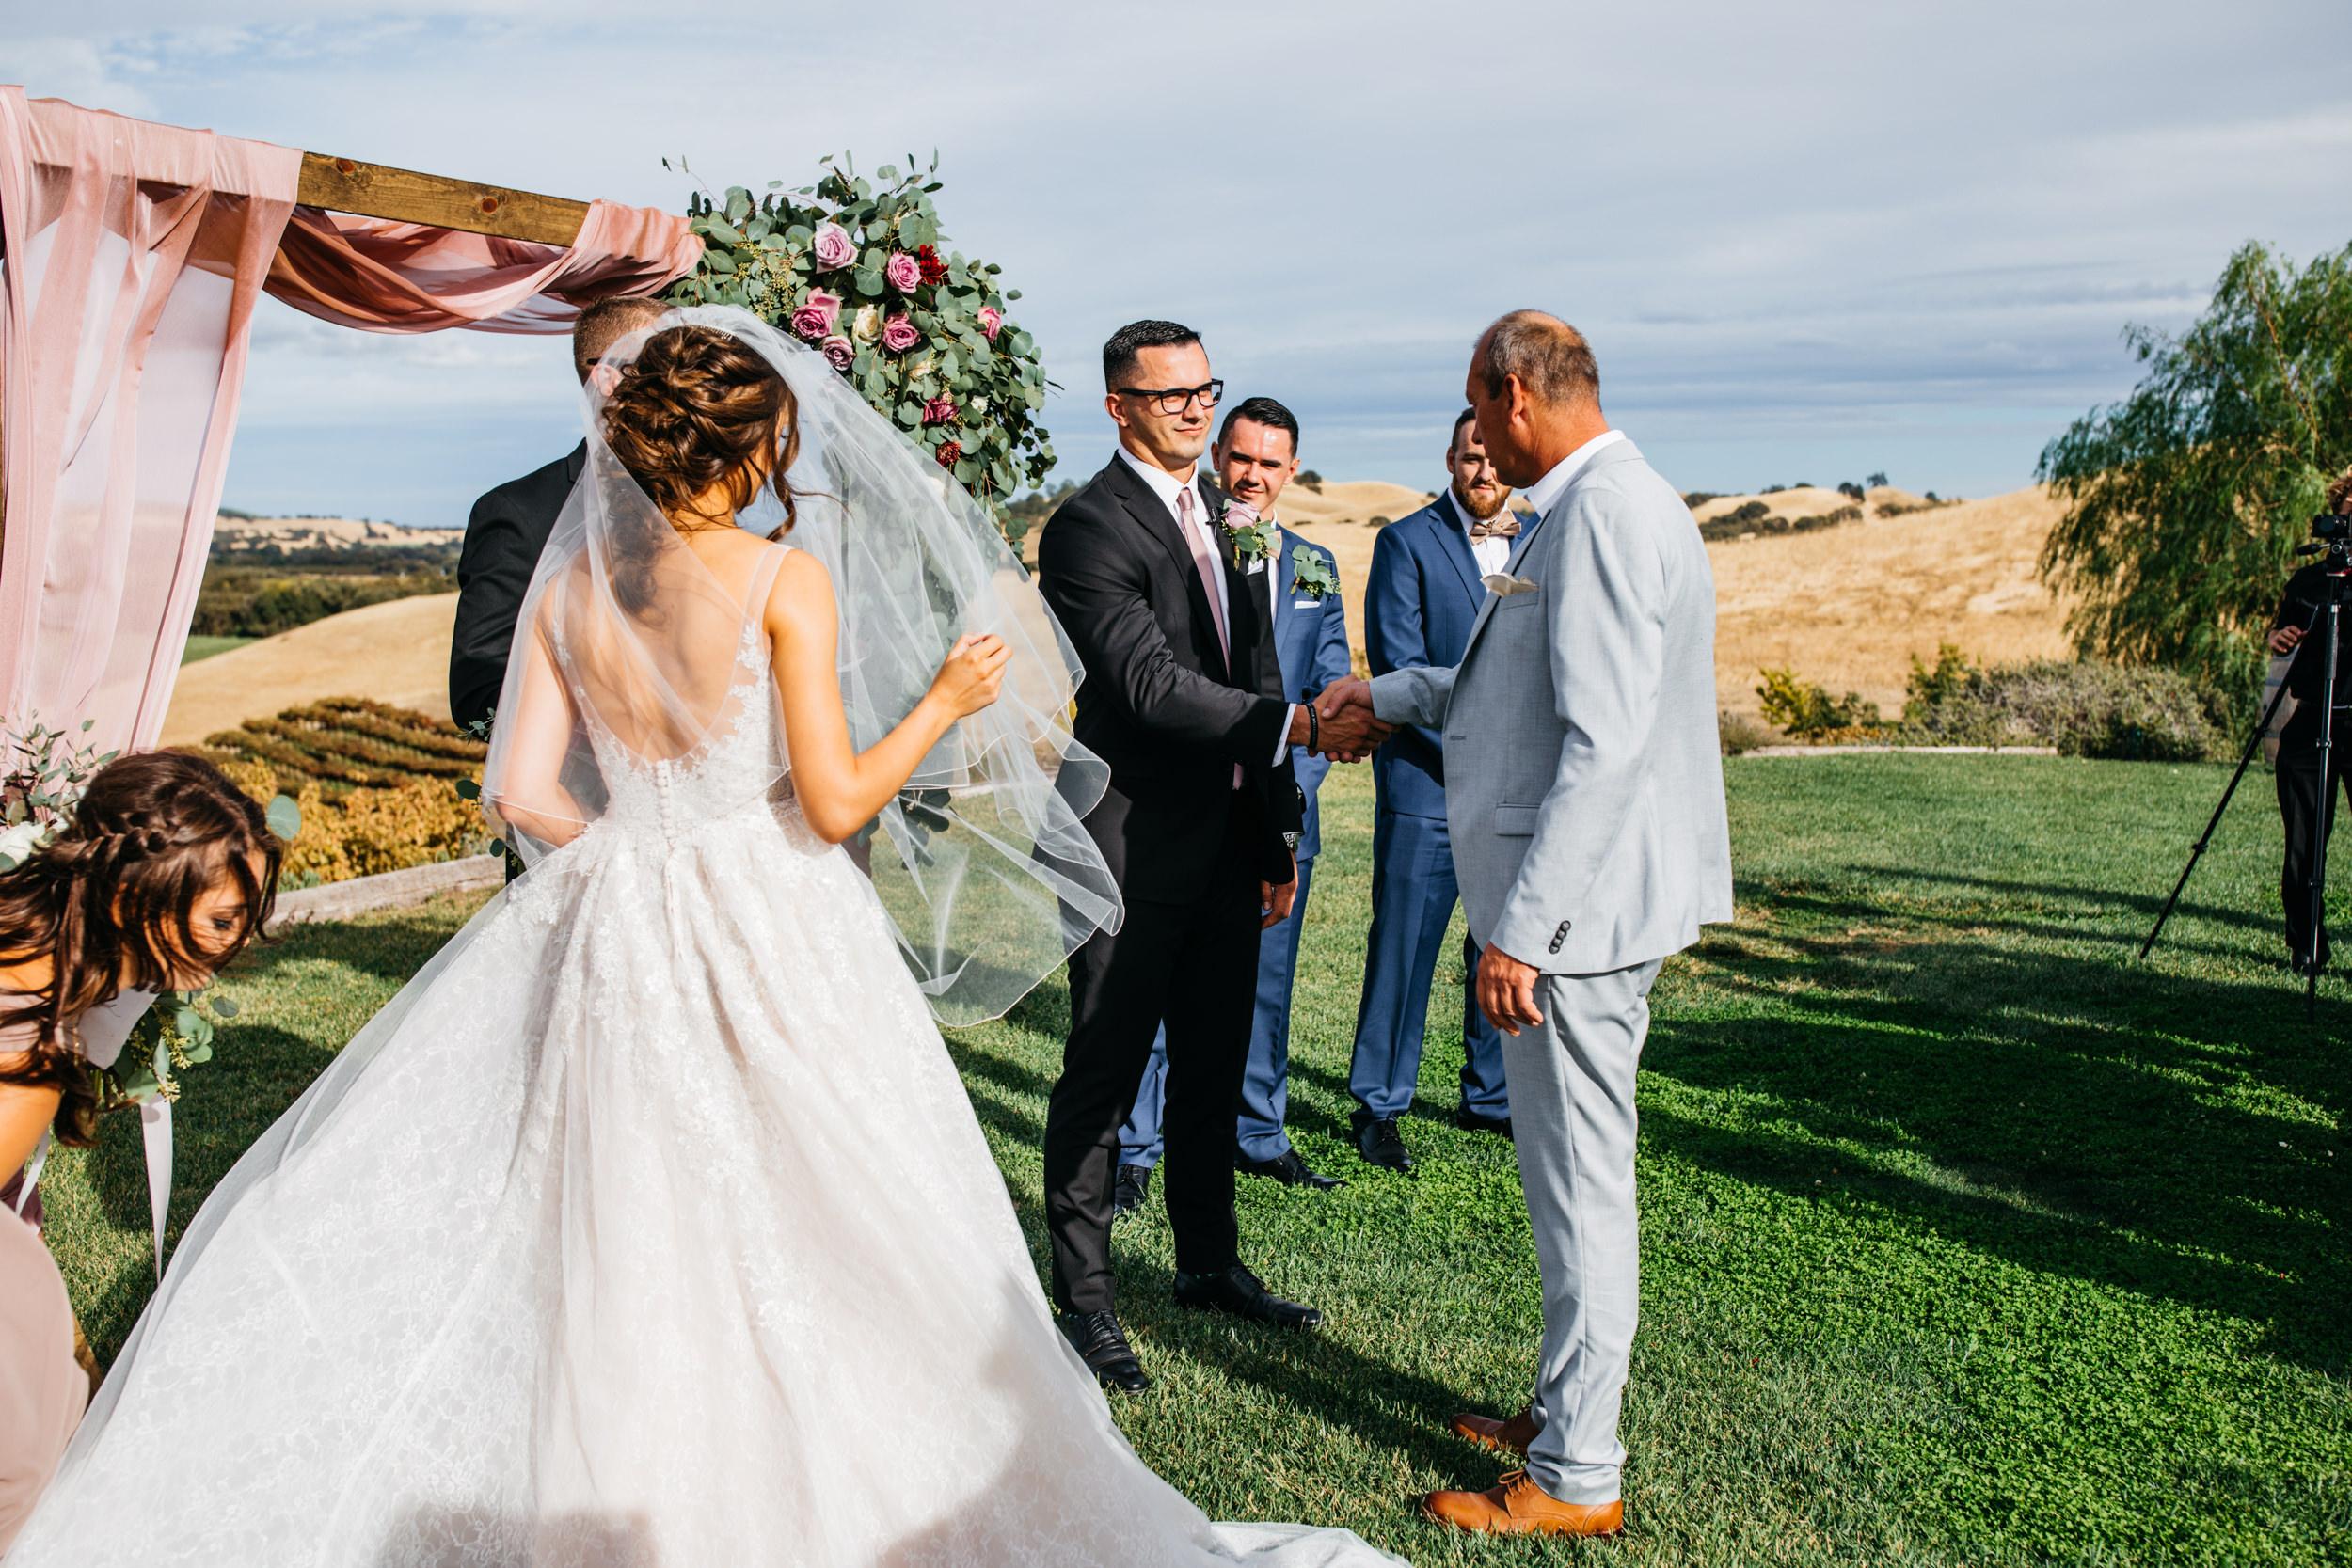 Nazariy_Tanya_Wedding-61.jpg